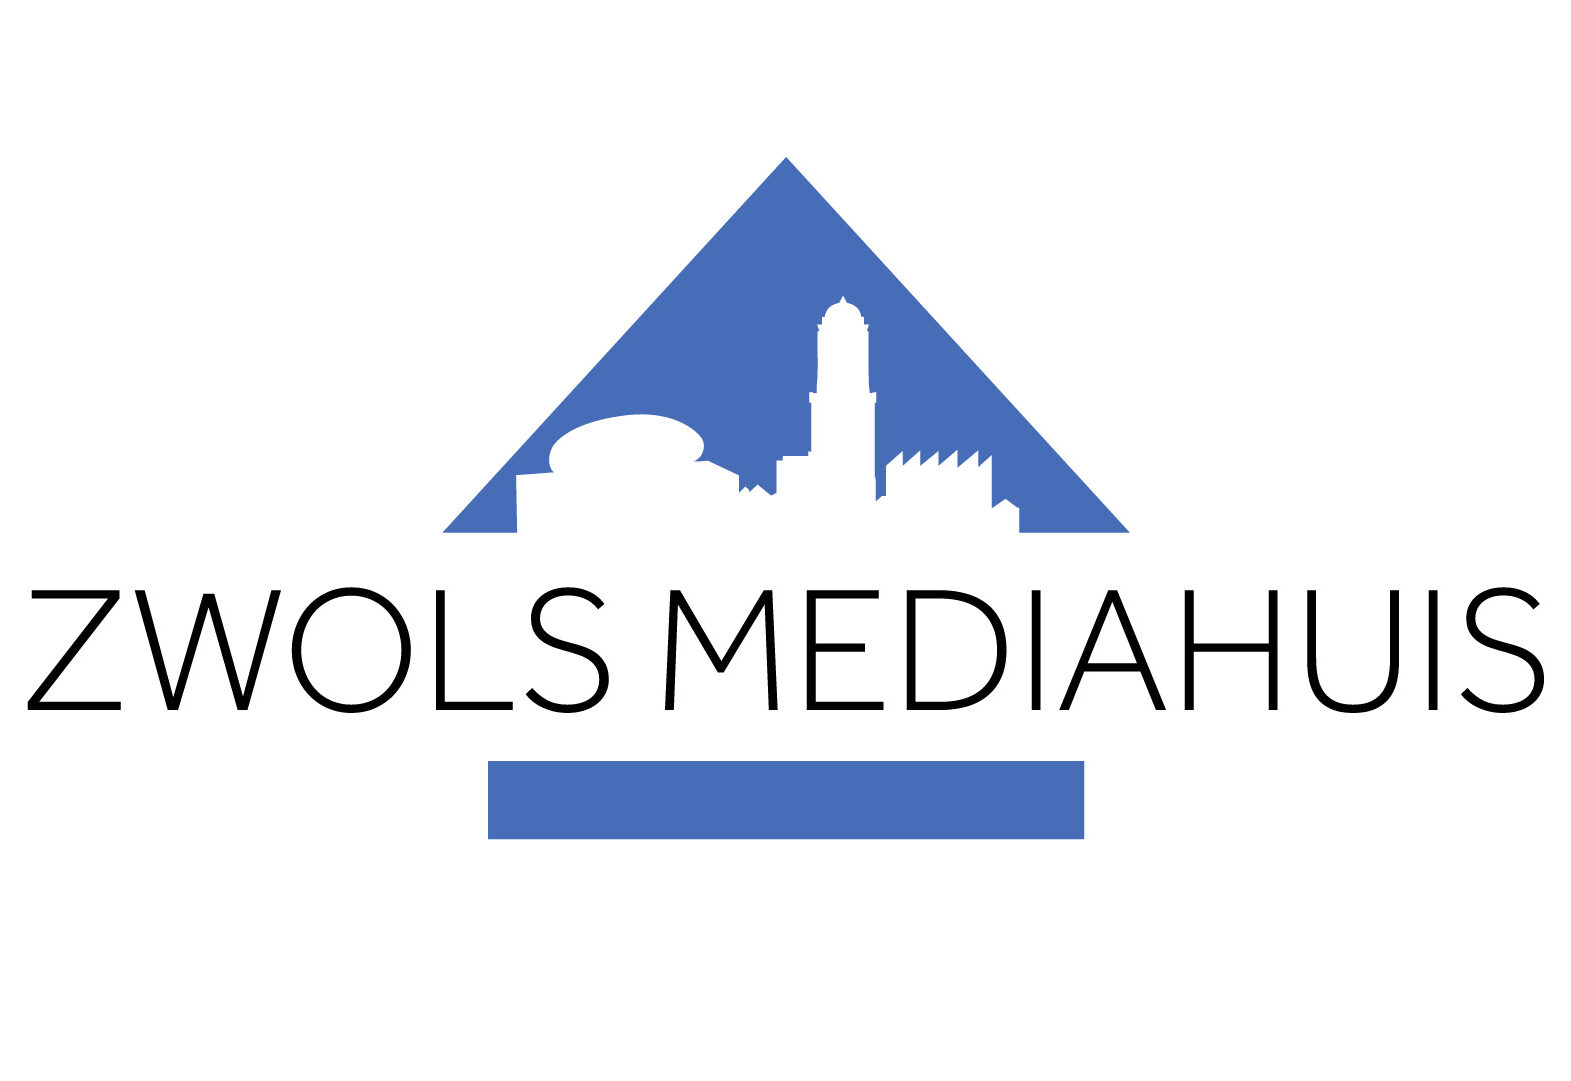 Zwols Mediahuis